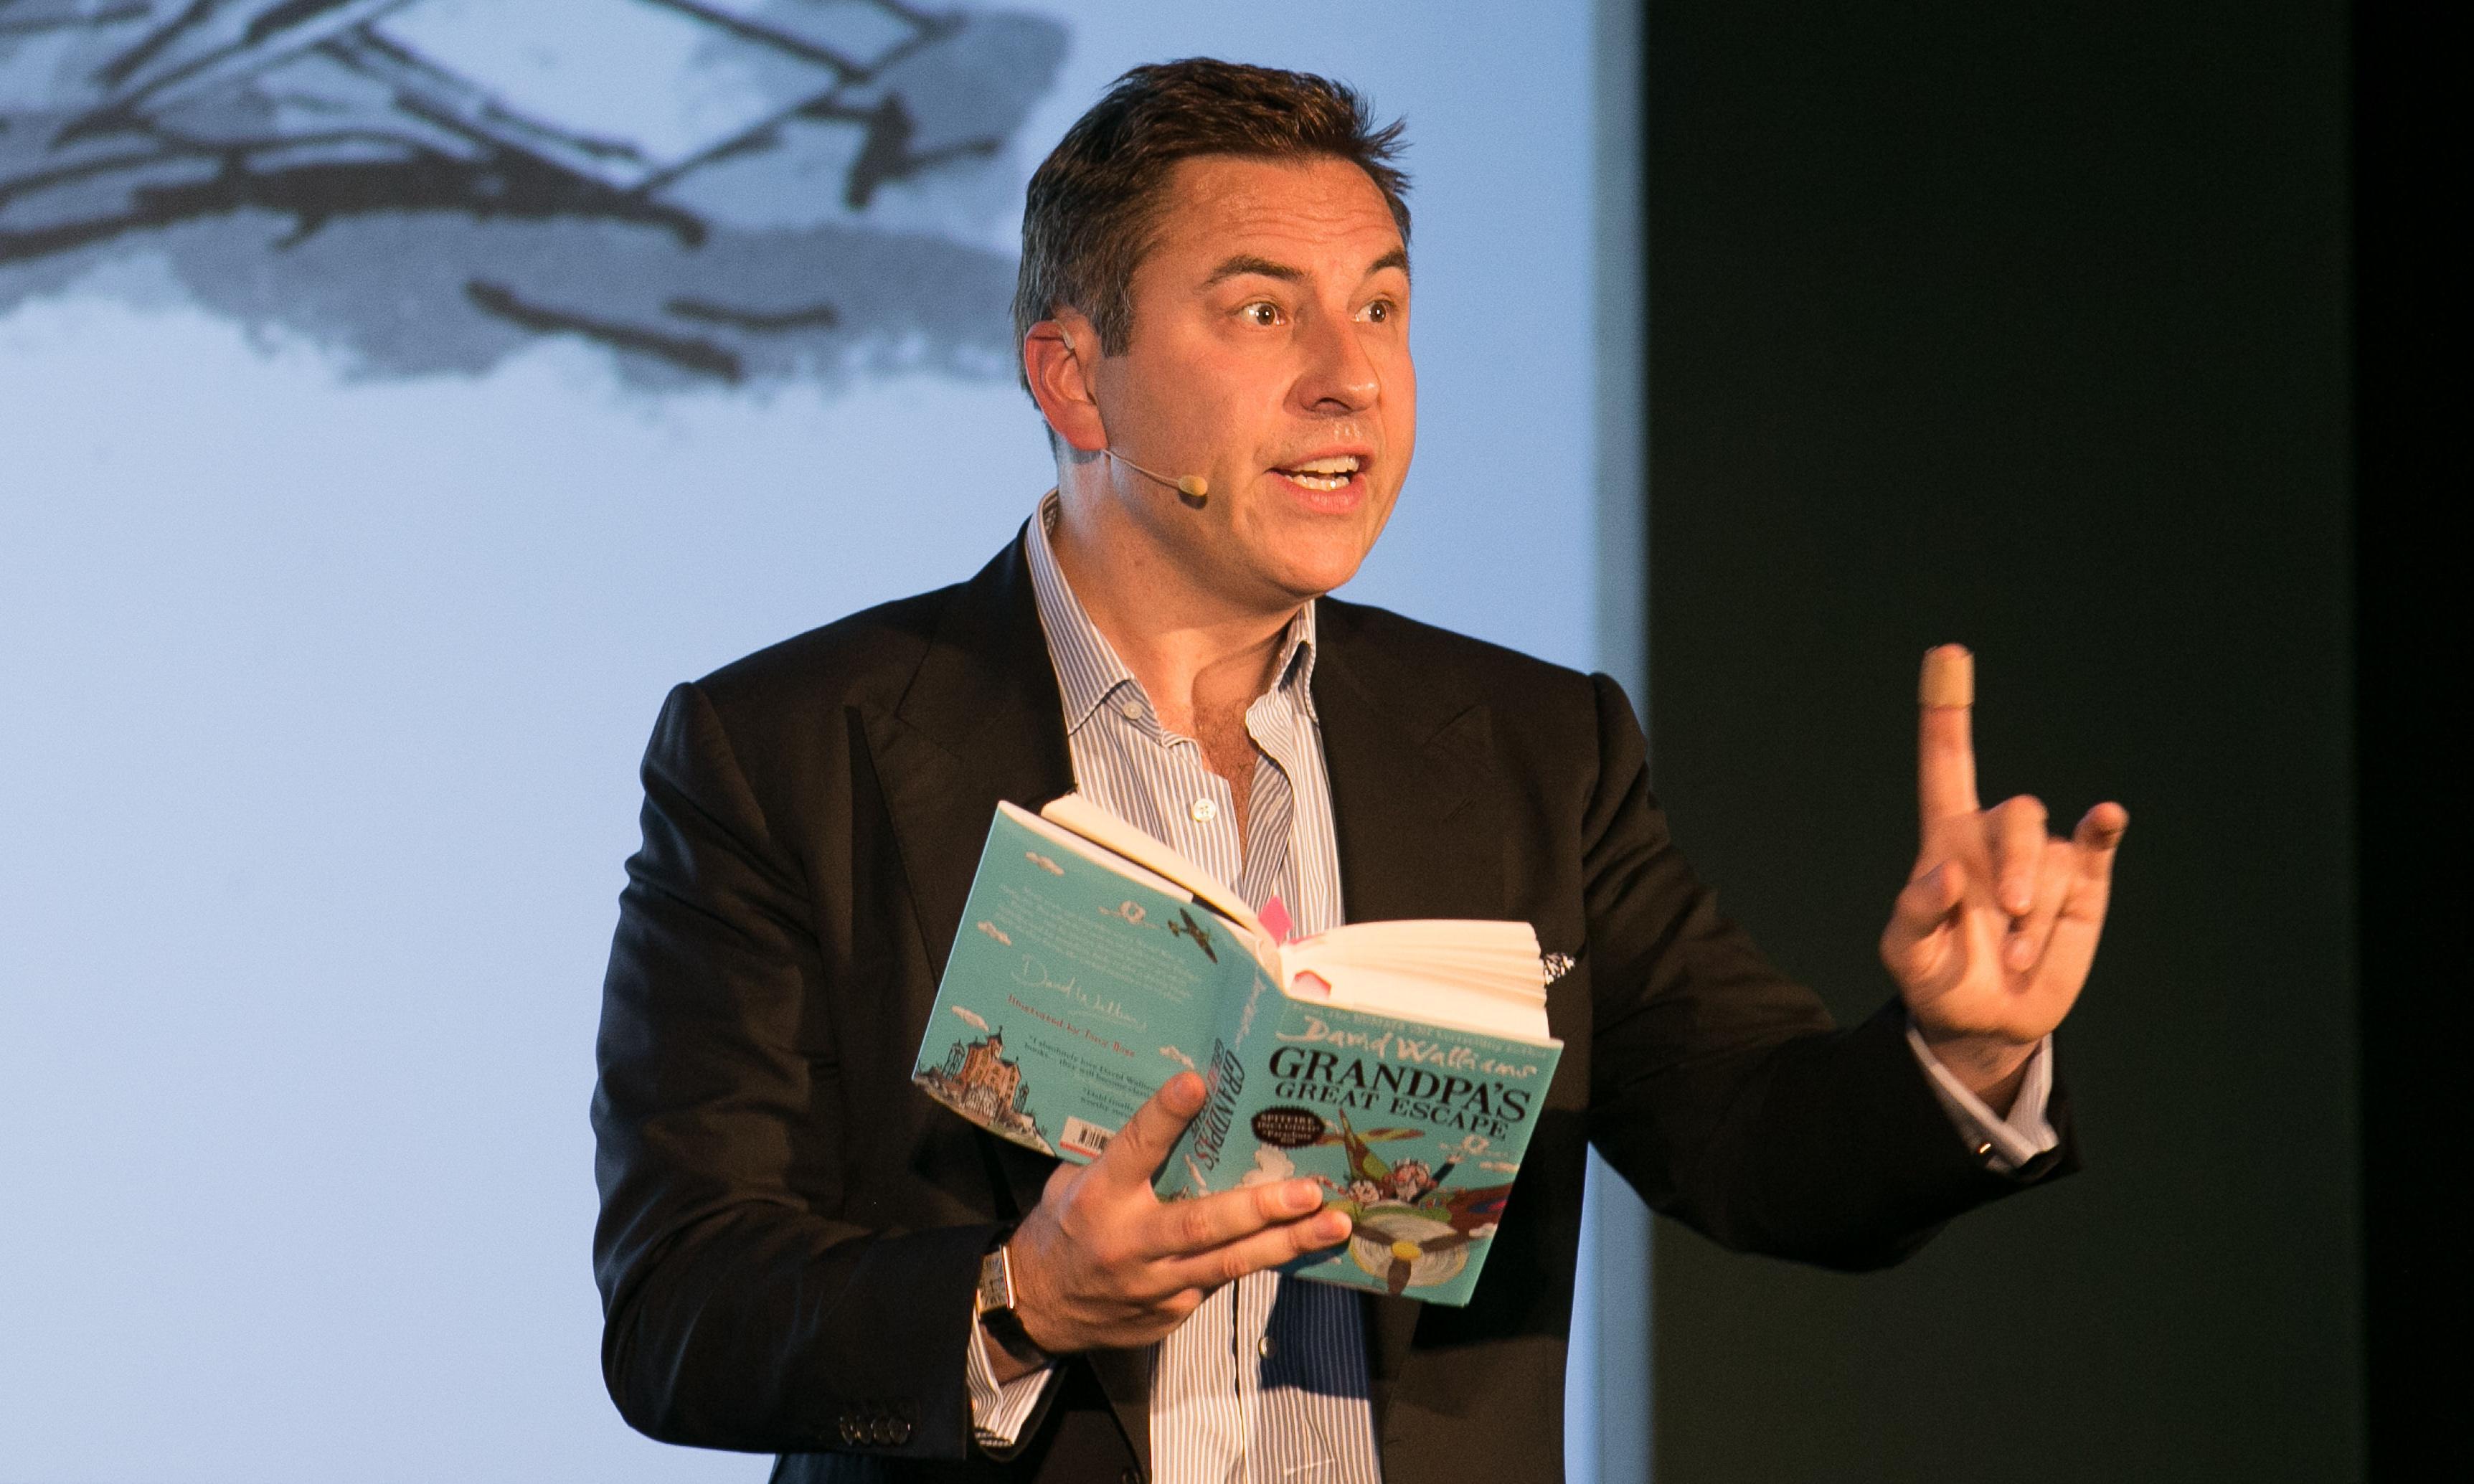 David Walliams calls for 'safeguarding' of libraries